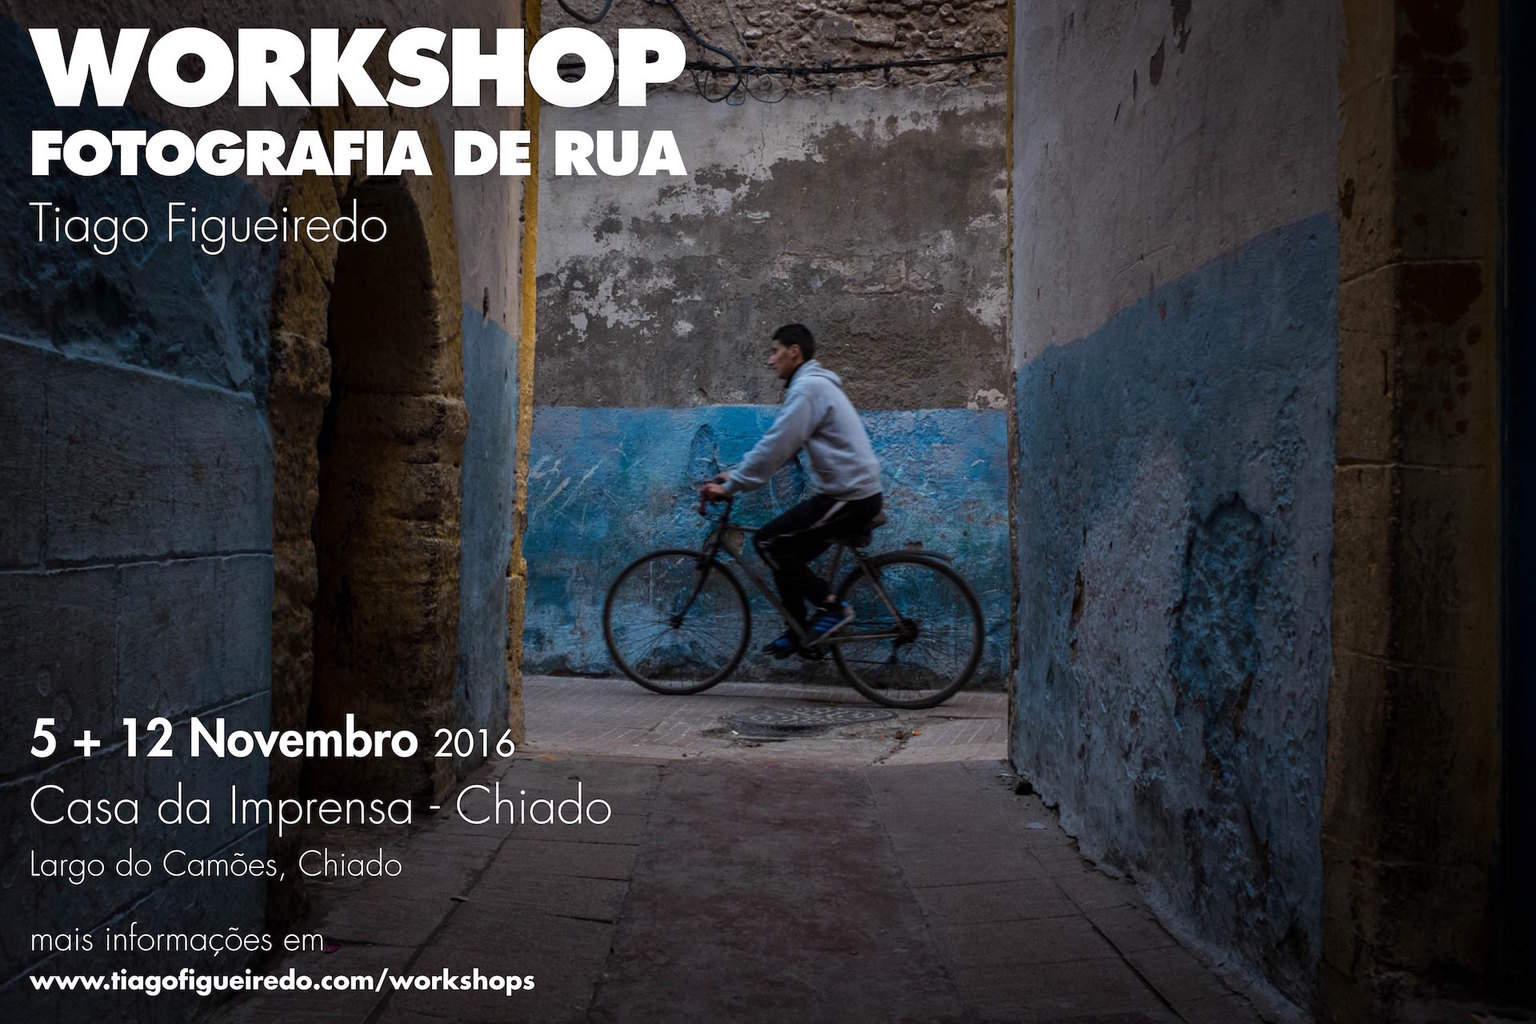 workshop-fotografia-rua-1